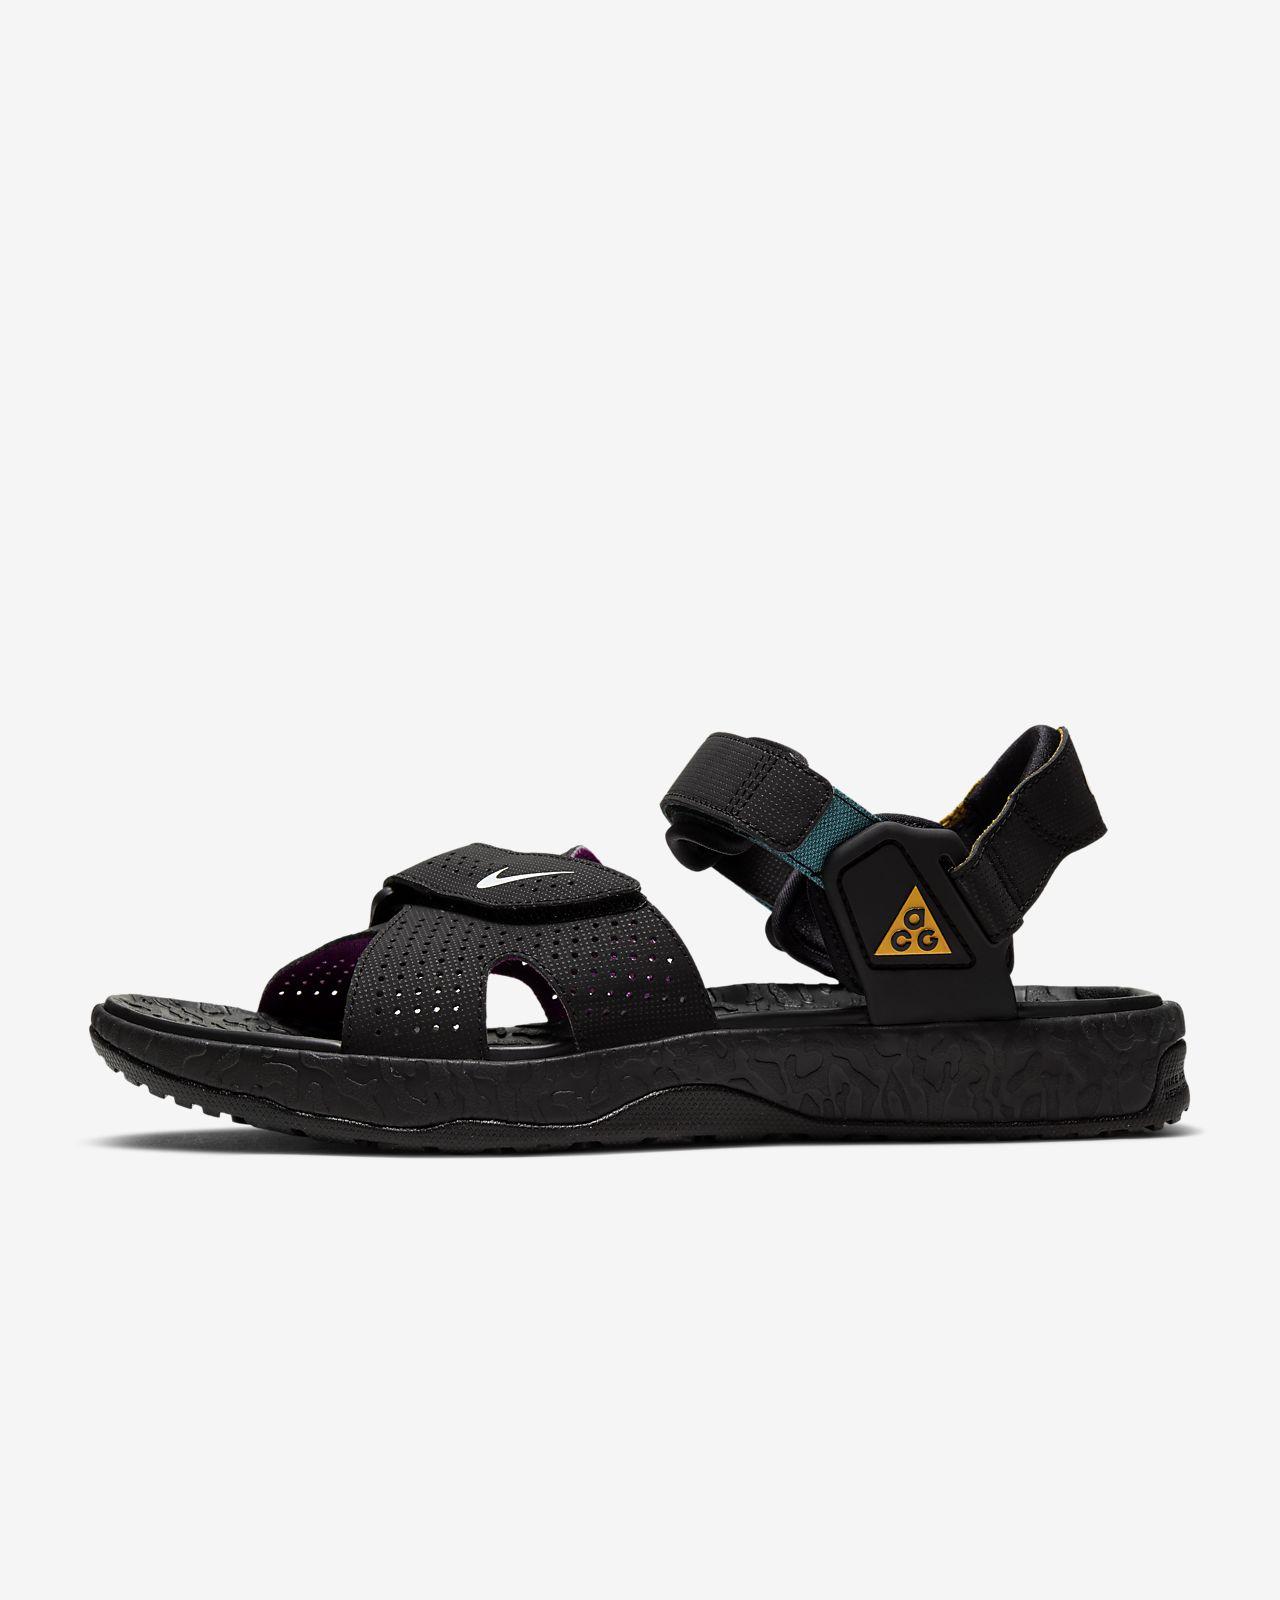 Sandalias Nike ACG Deschutz